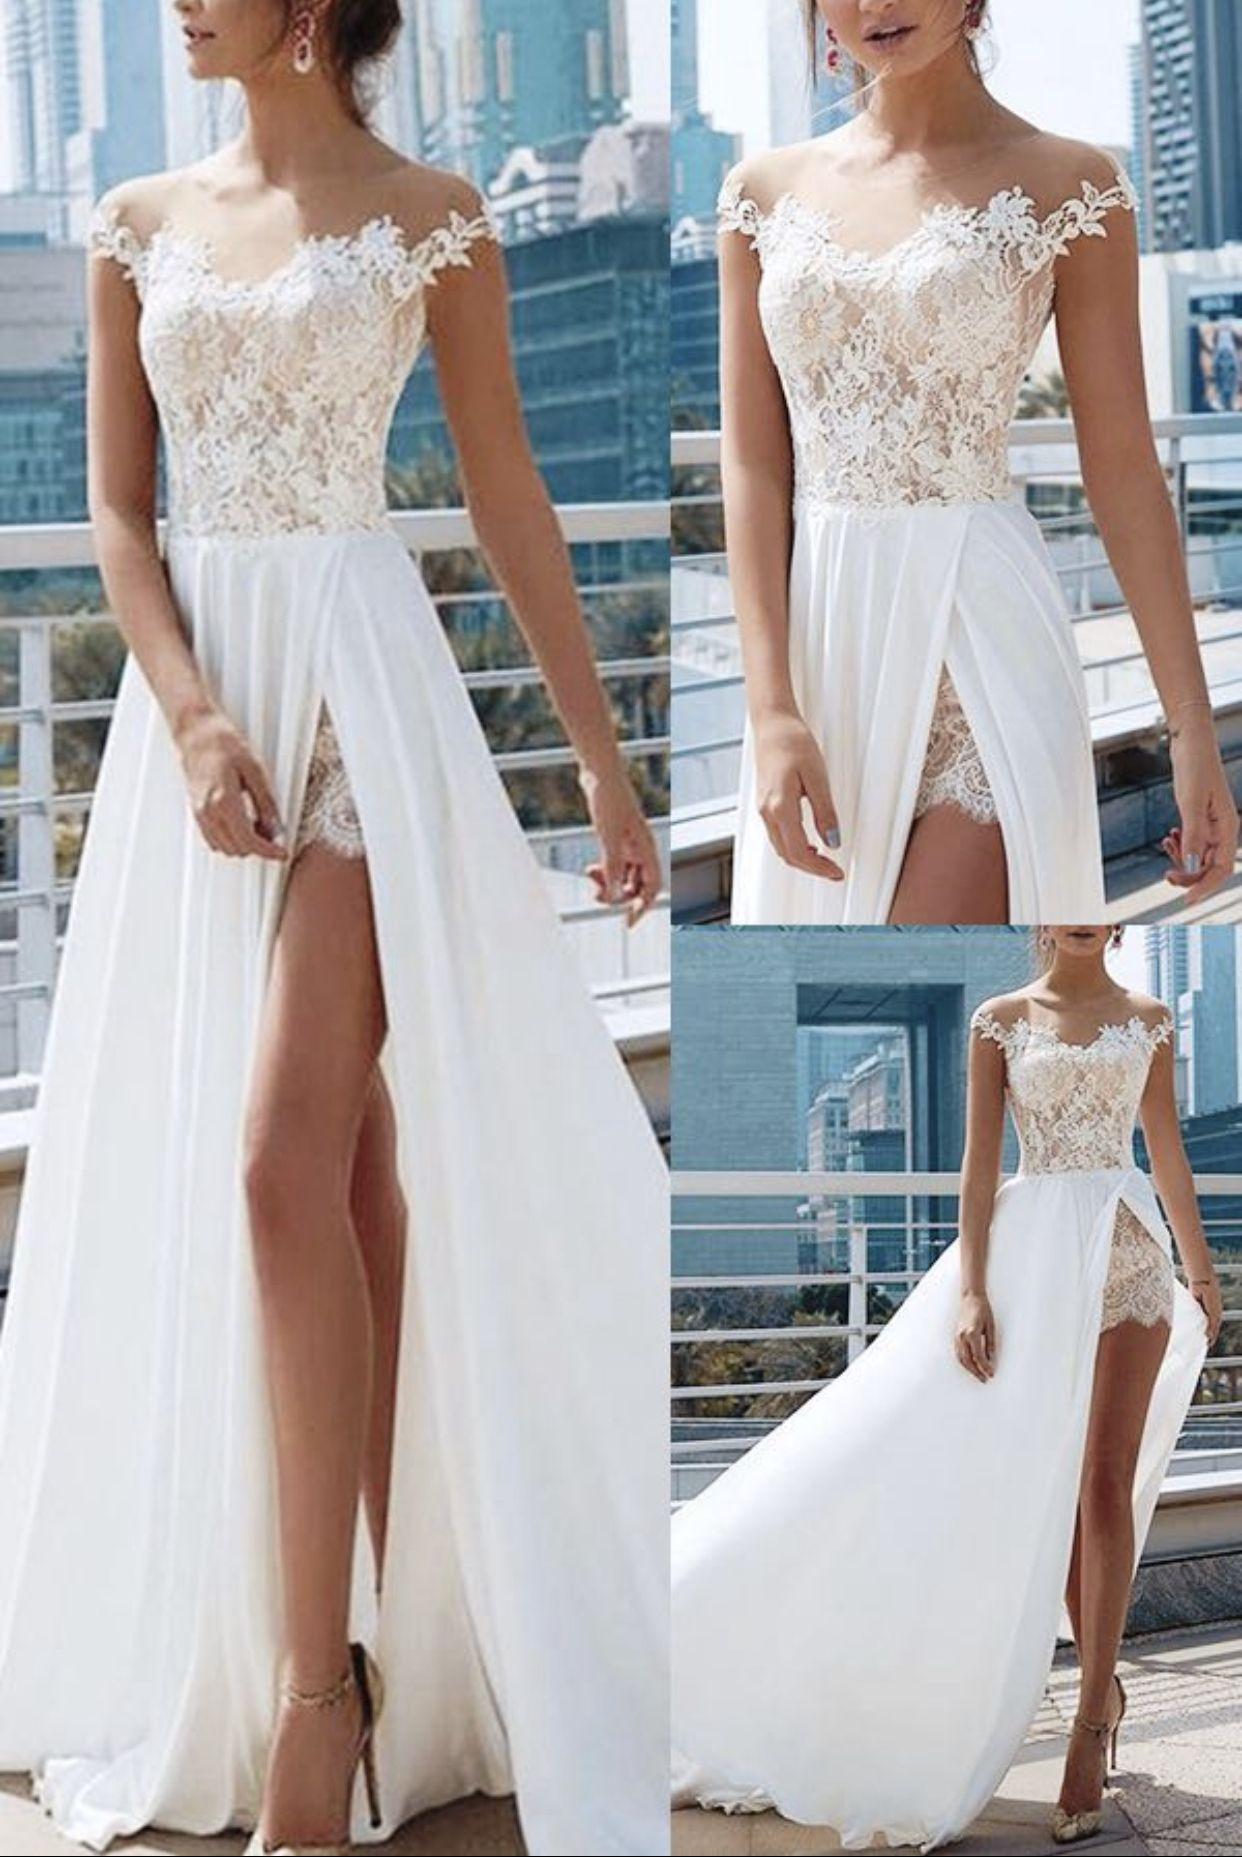 Illusion Neck Split Front Lace Beach Wedding Dress 2021 Lace Beach Wedding Dress Wedding Dresses Whimsical Beach Wedding Dress